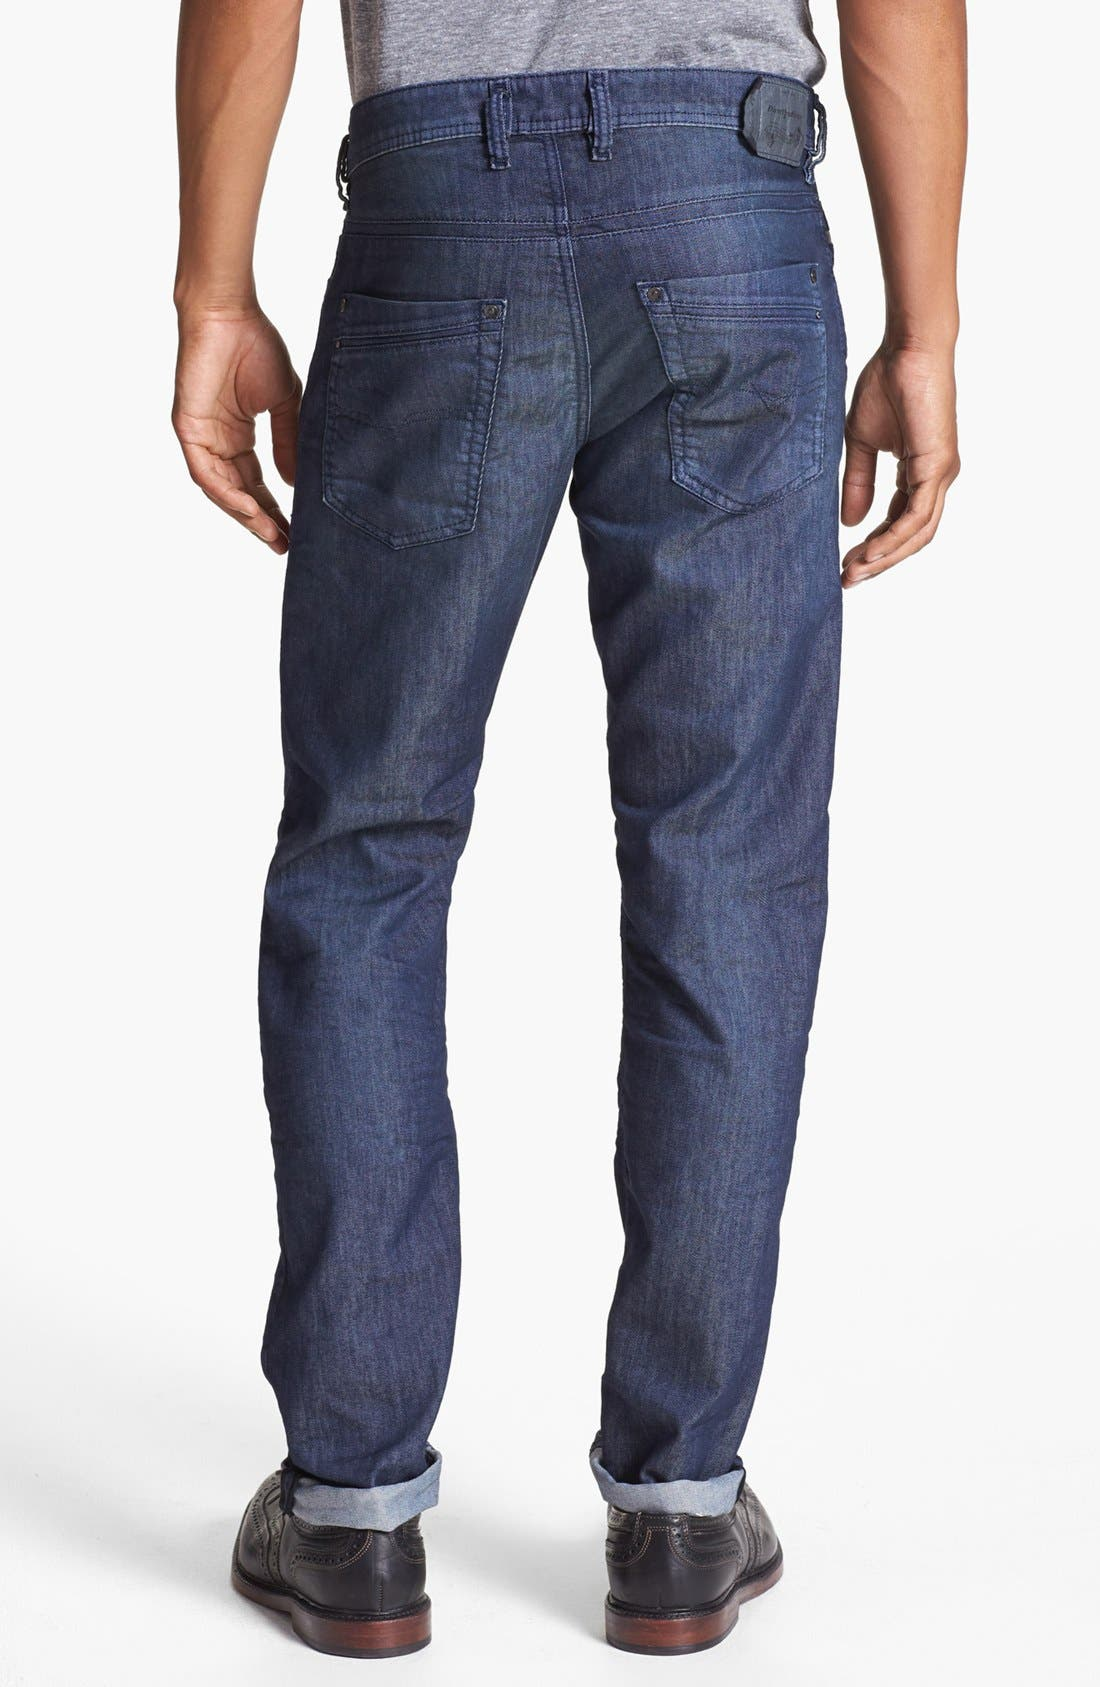 Alternate Image 1 Selected - DIESEL® 'Krayver' Slim Fit Selvedge Jeans (Blue)